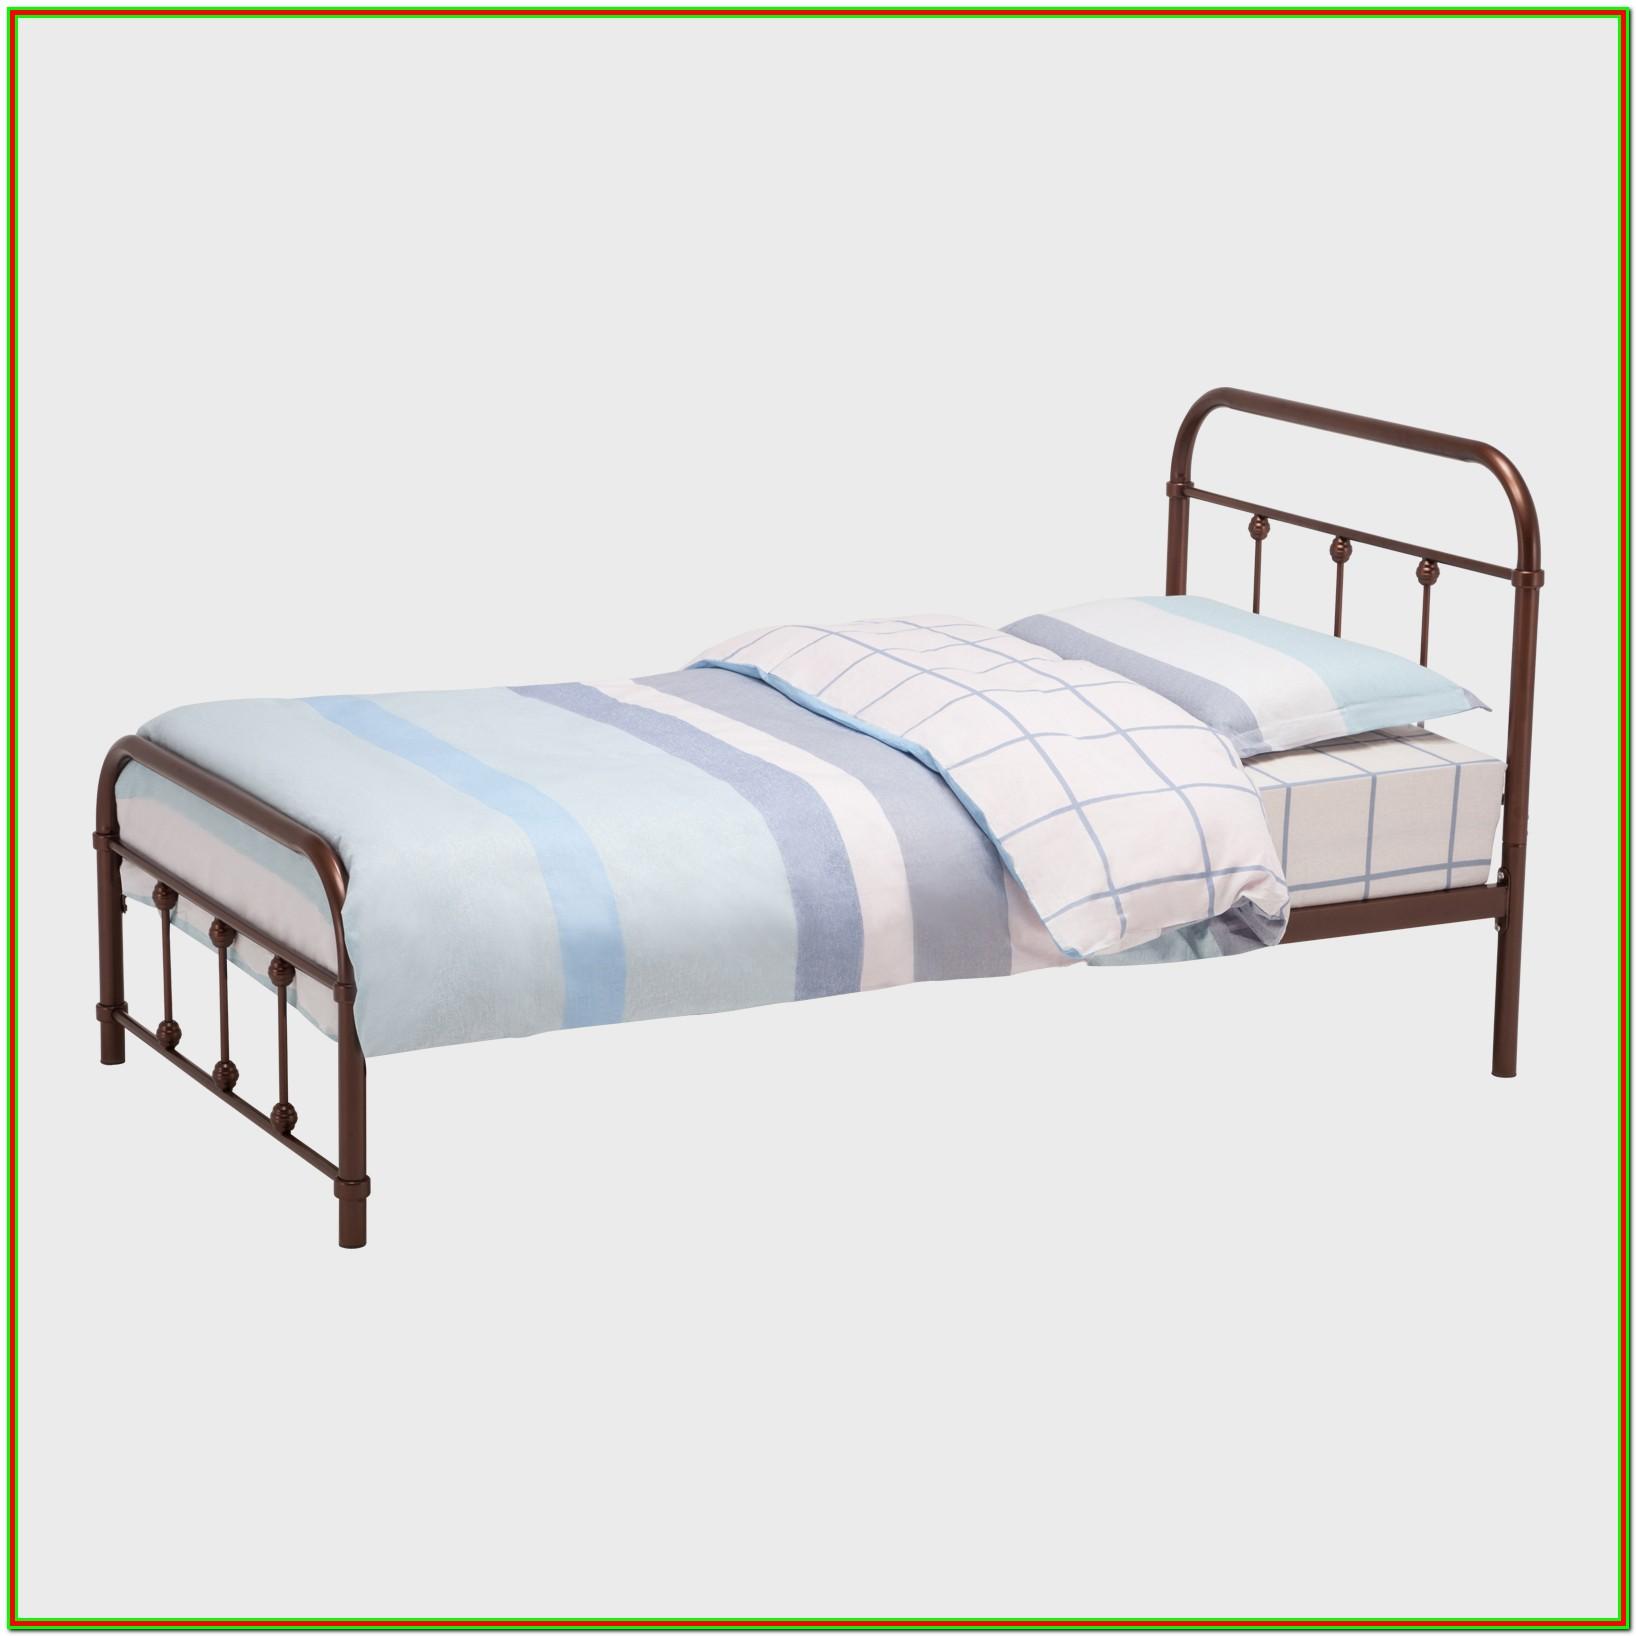 Metal Platform Bed Frame With Headboard